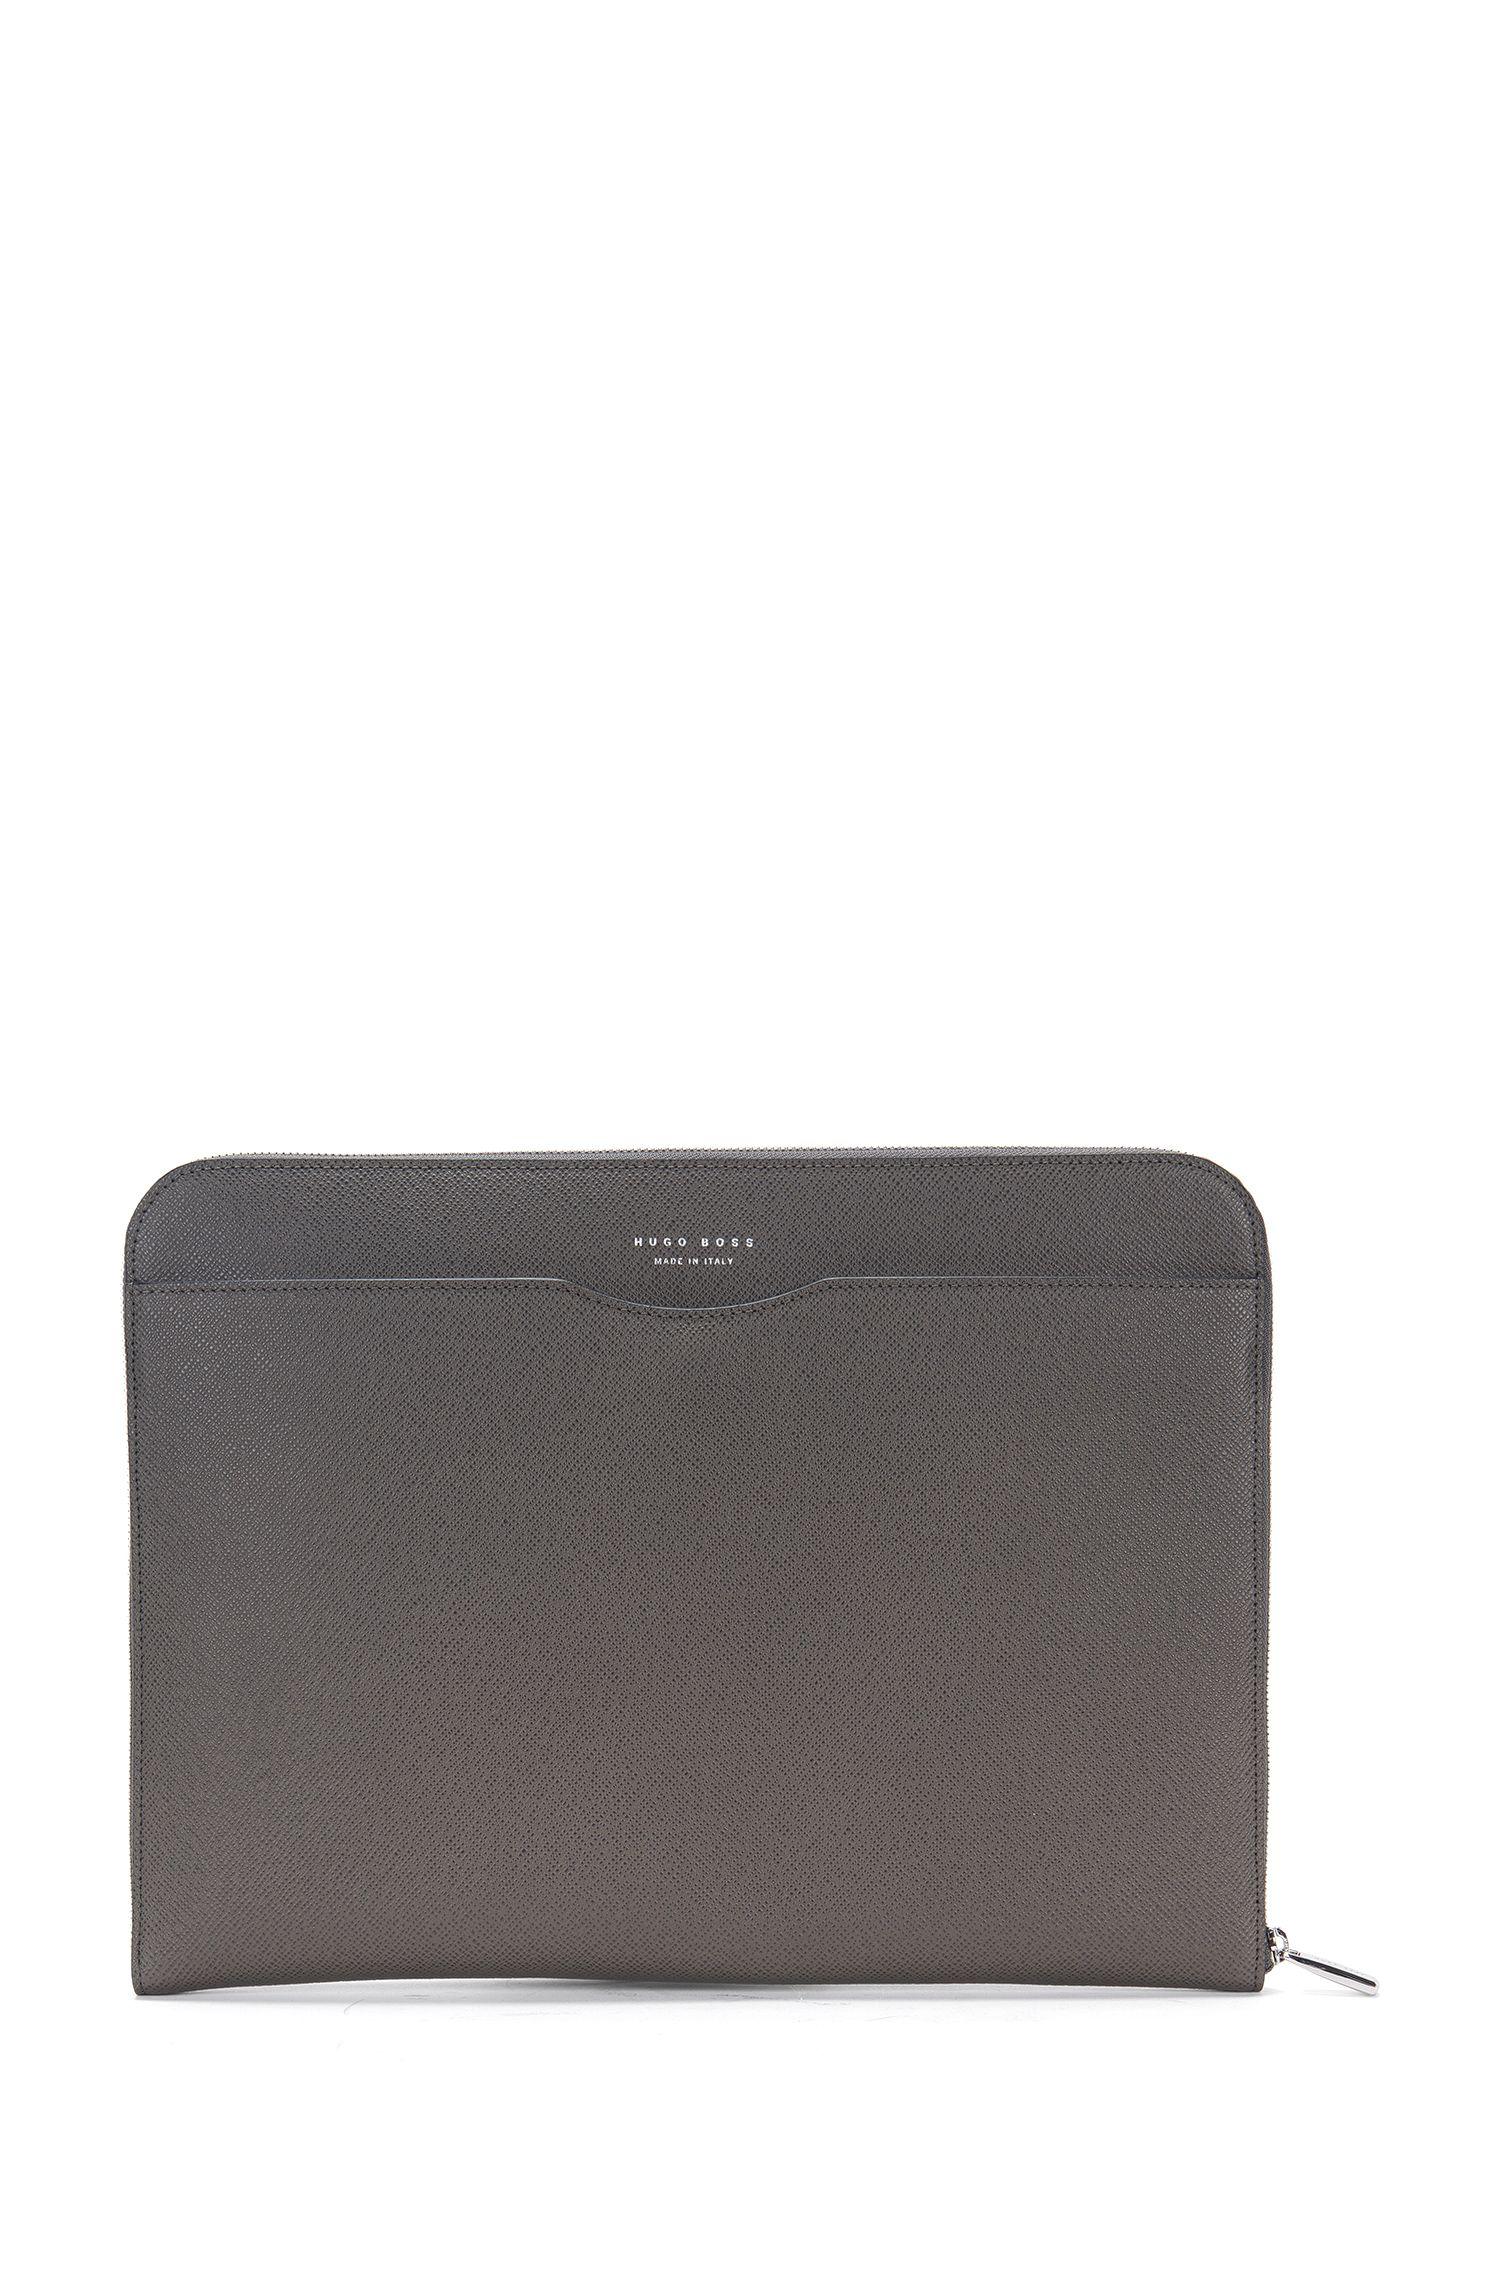 Porte-document de la collection Signature en cuir palmellato